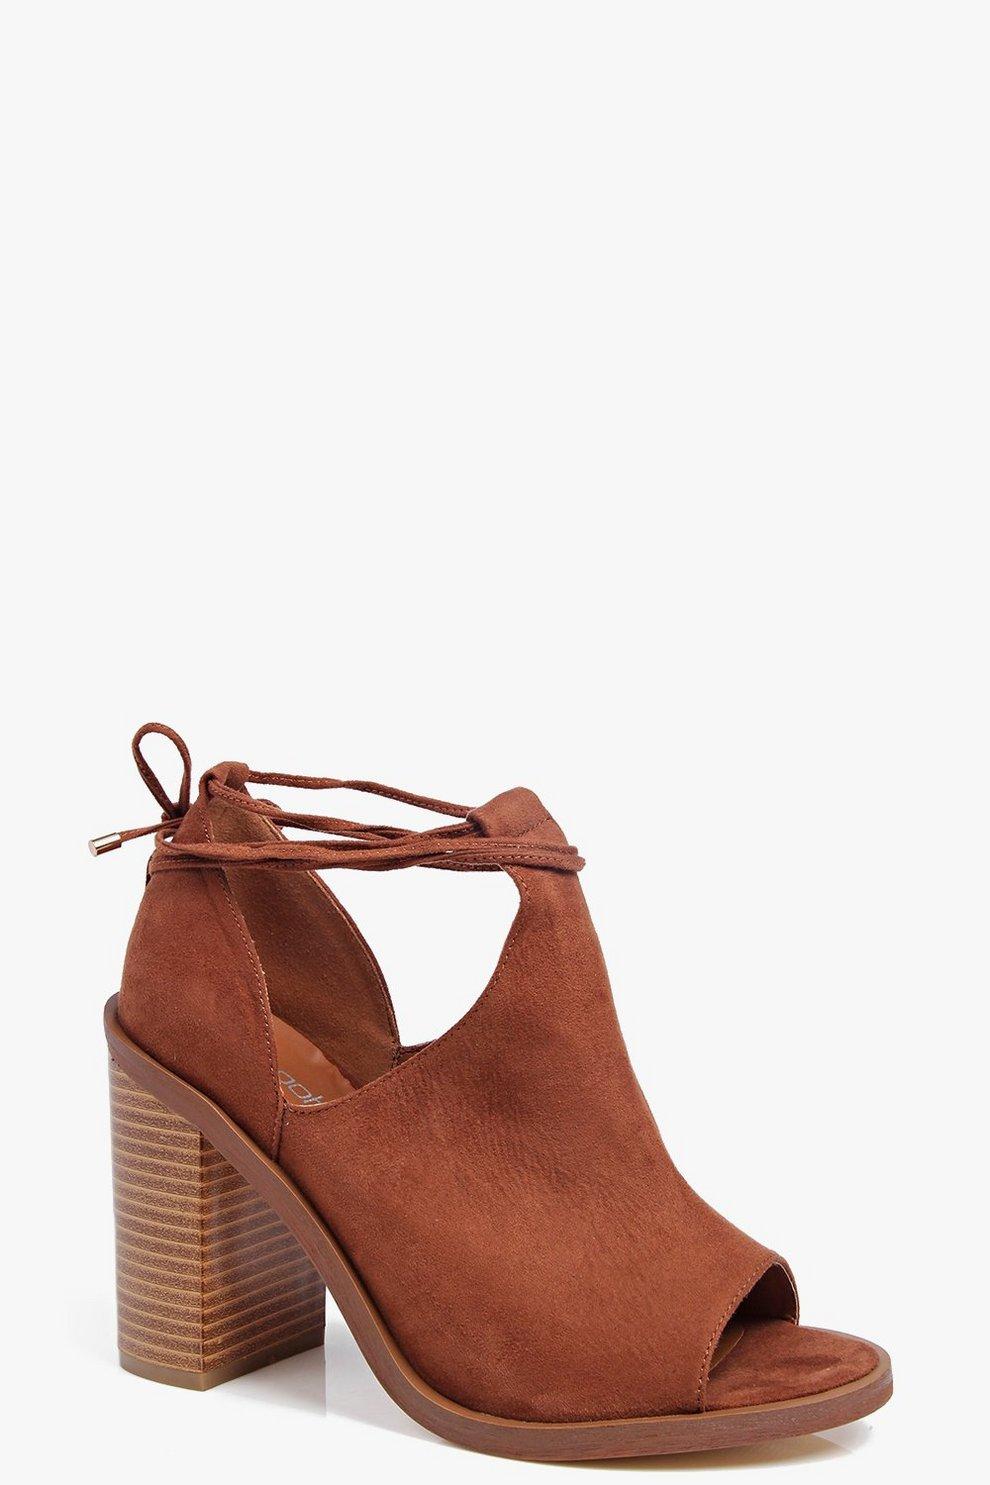 1a022112dcf Eva Peeptoe Wrap Strap Block Heel Shoe Boot